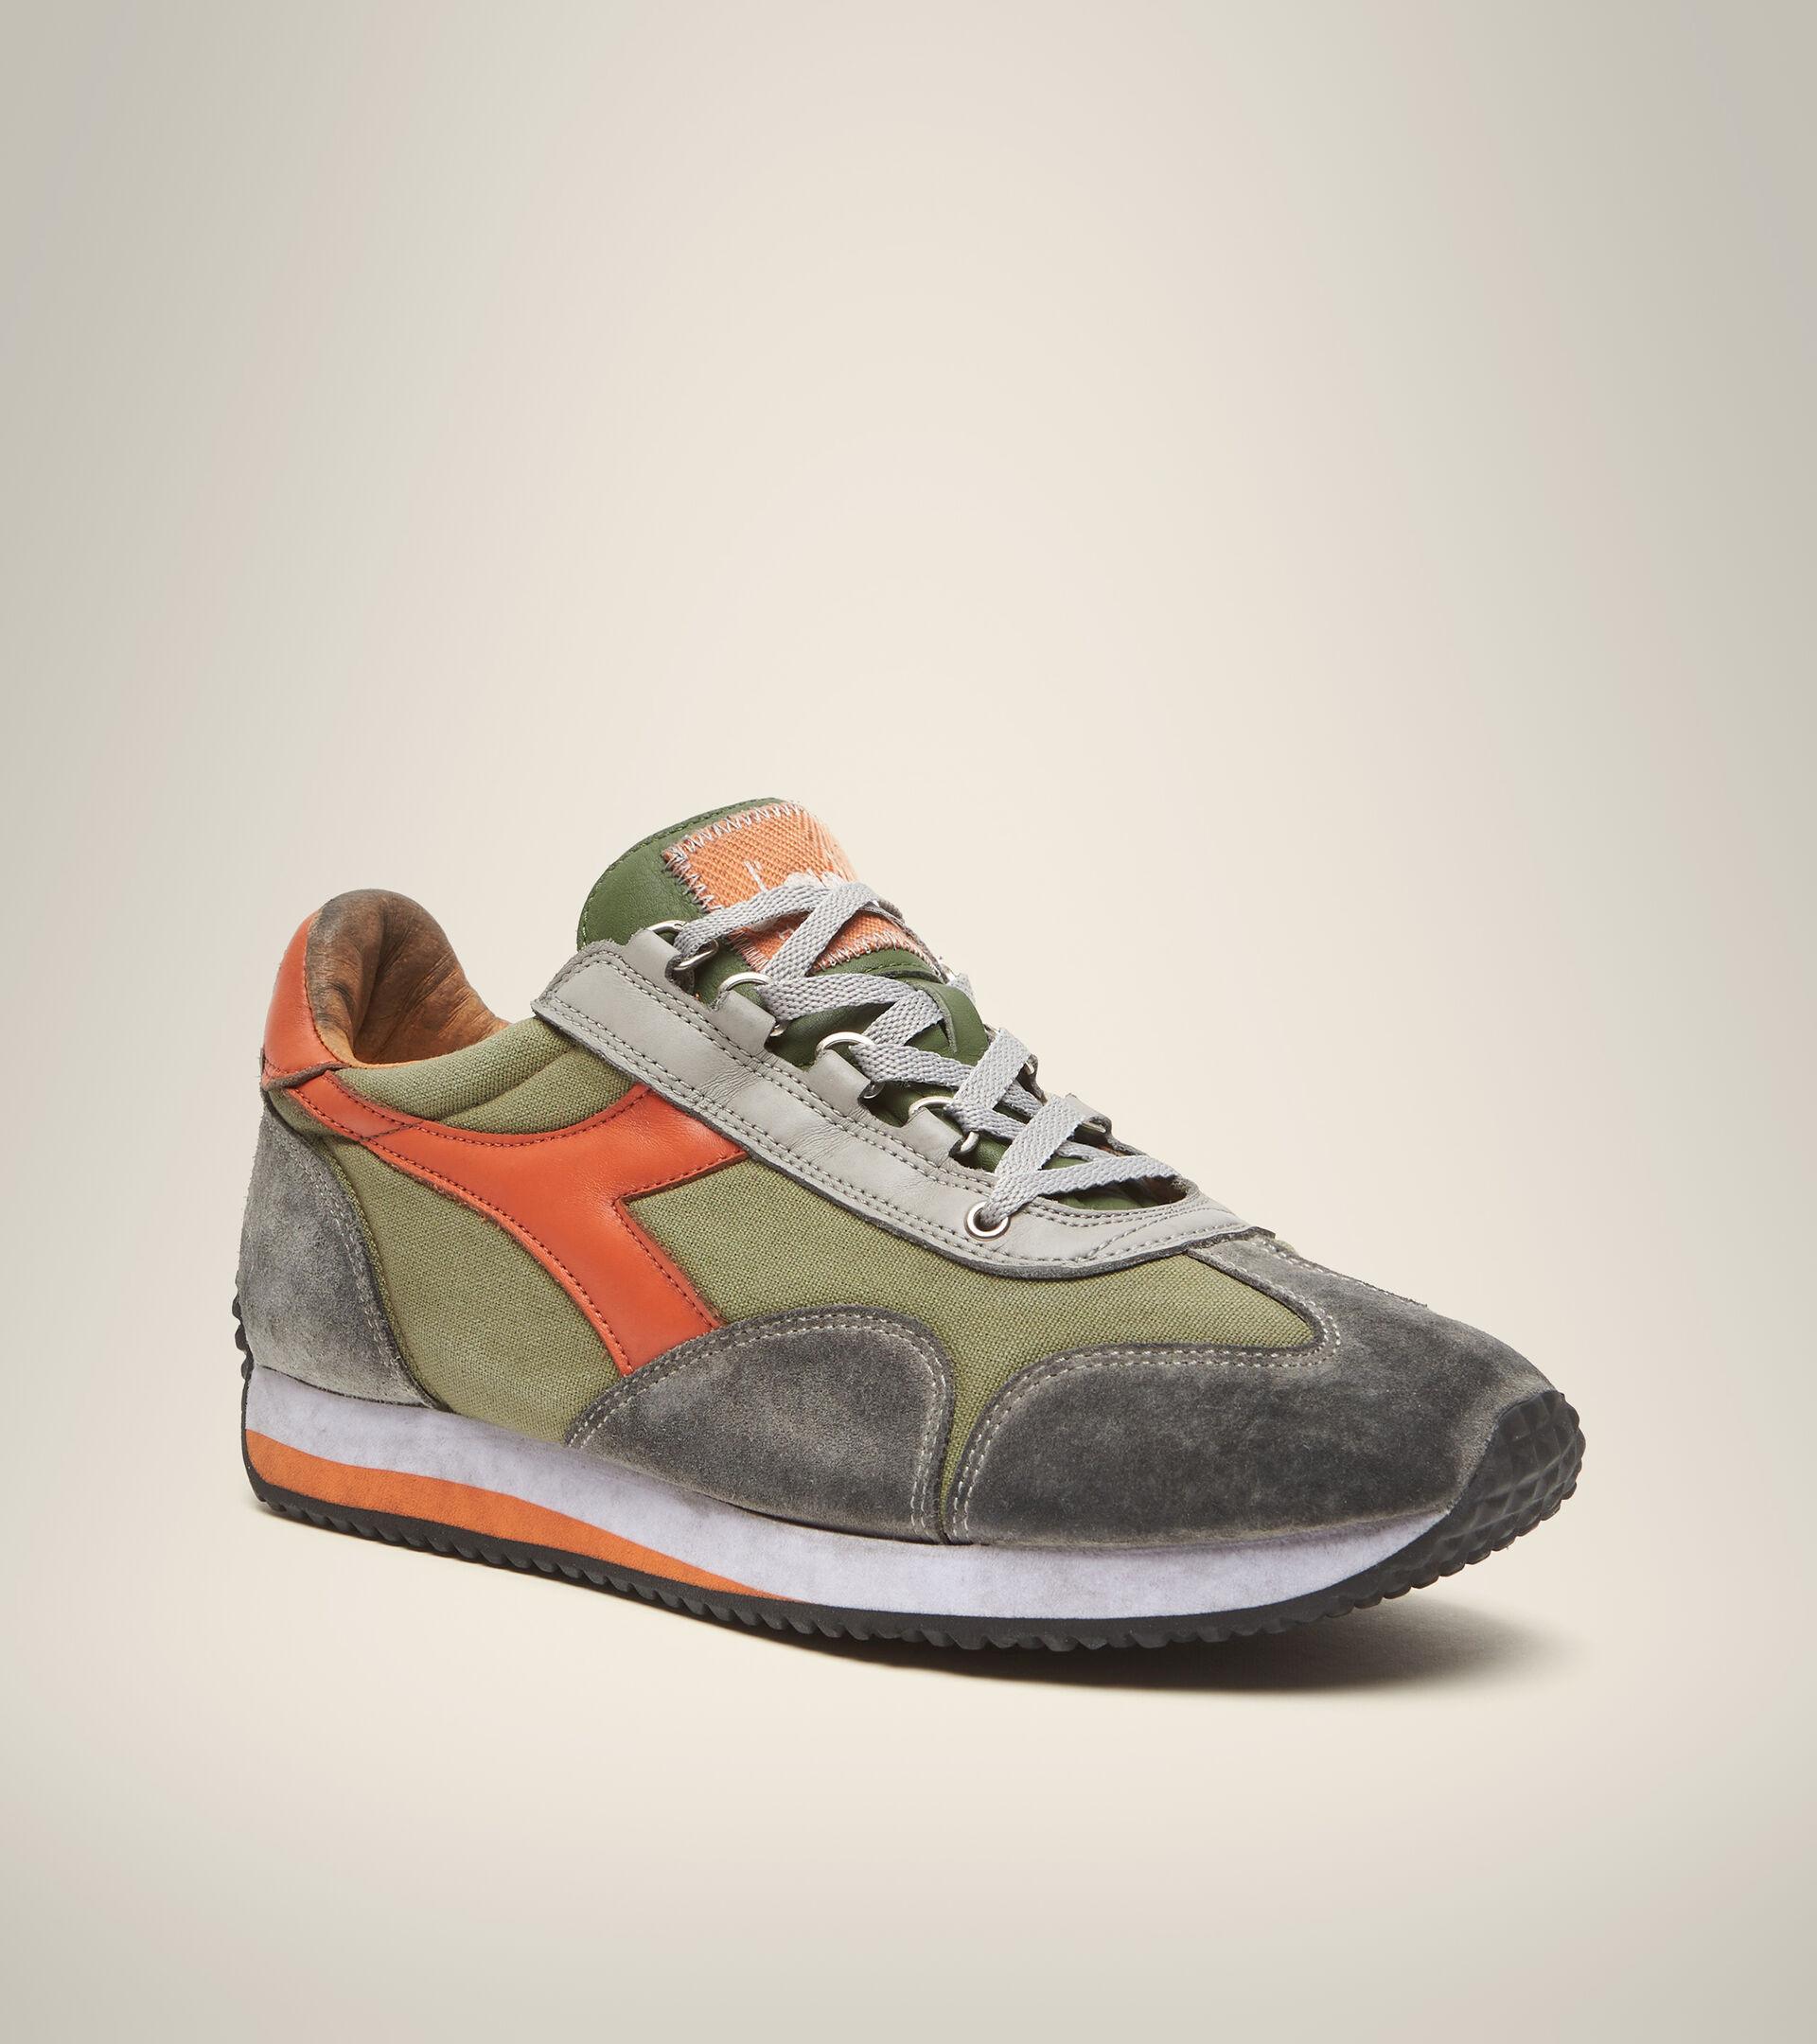 Footwear Heritage UNISEX EQUIPE H DIRTY STONE WASH EVO GREEN LODEN Diadora